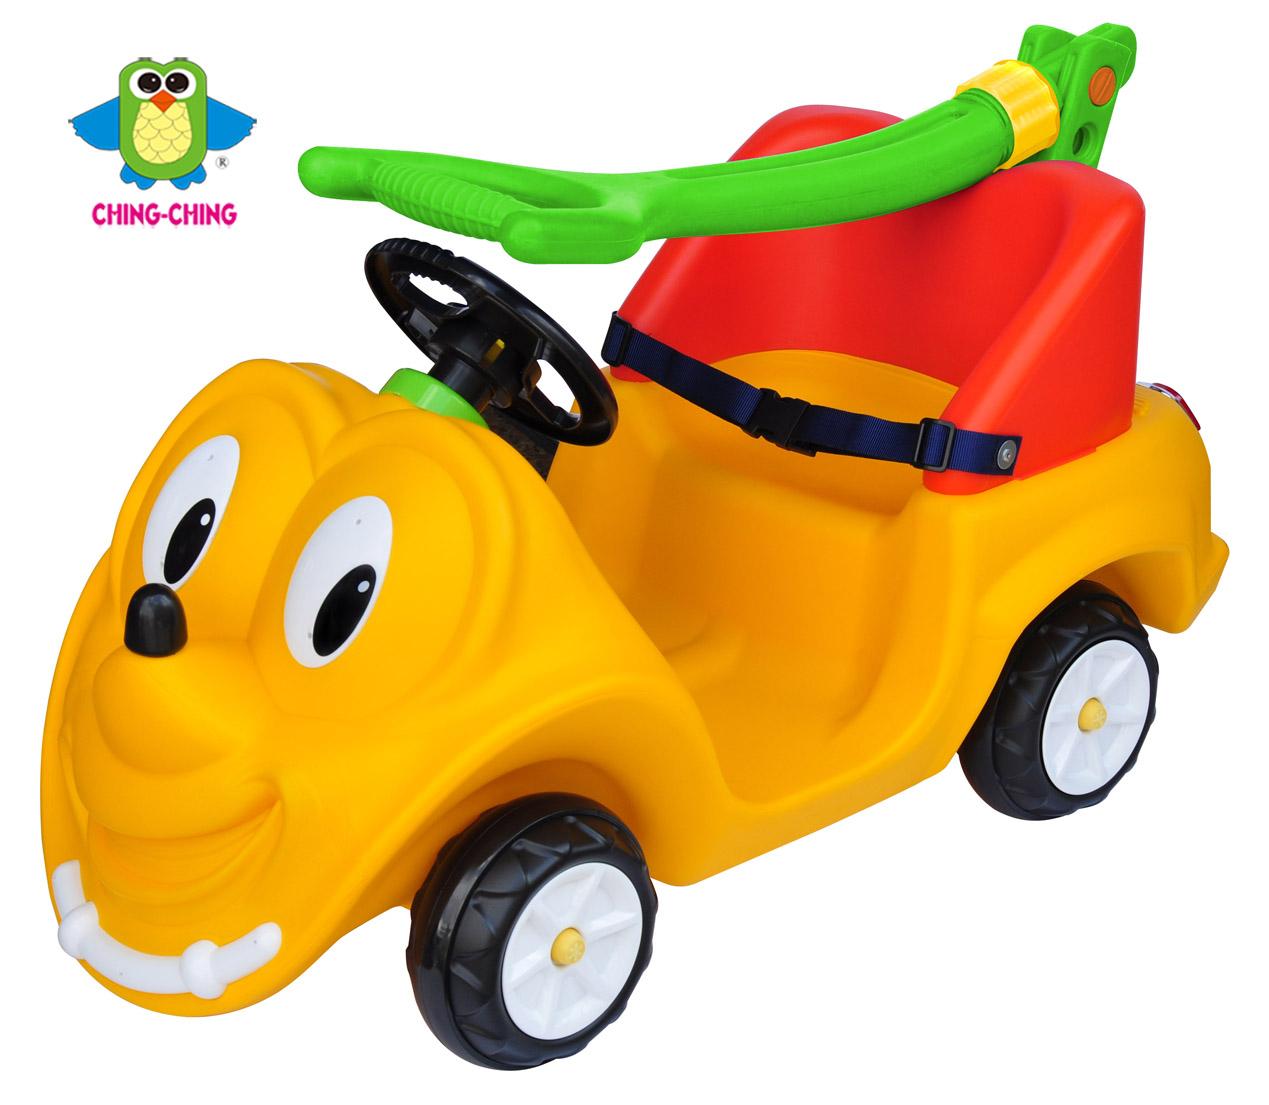 Taiwan Ride On Car Push Car Amp Walker 2 In 1 Plastic Toy